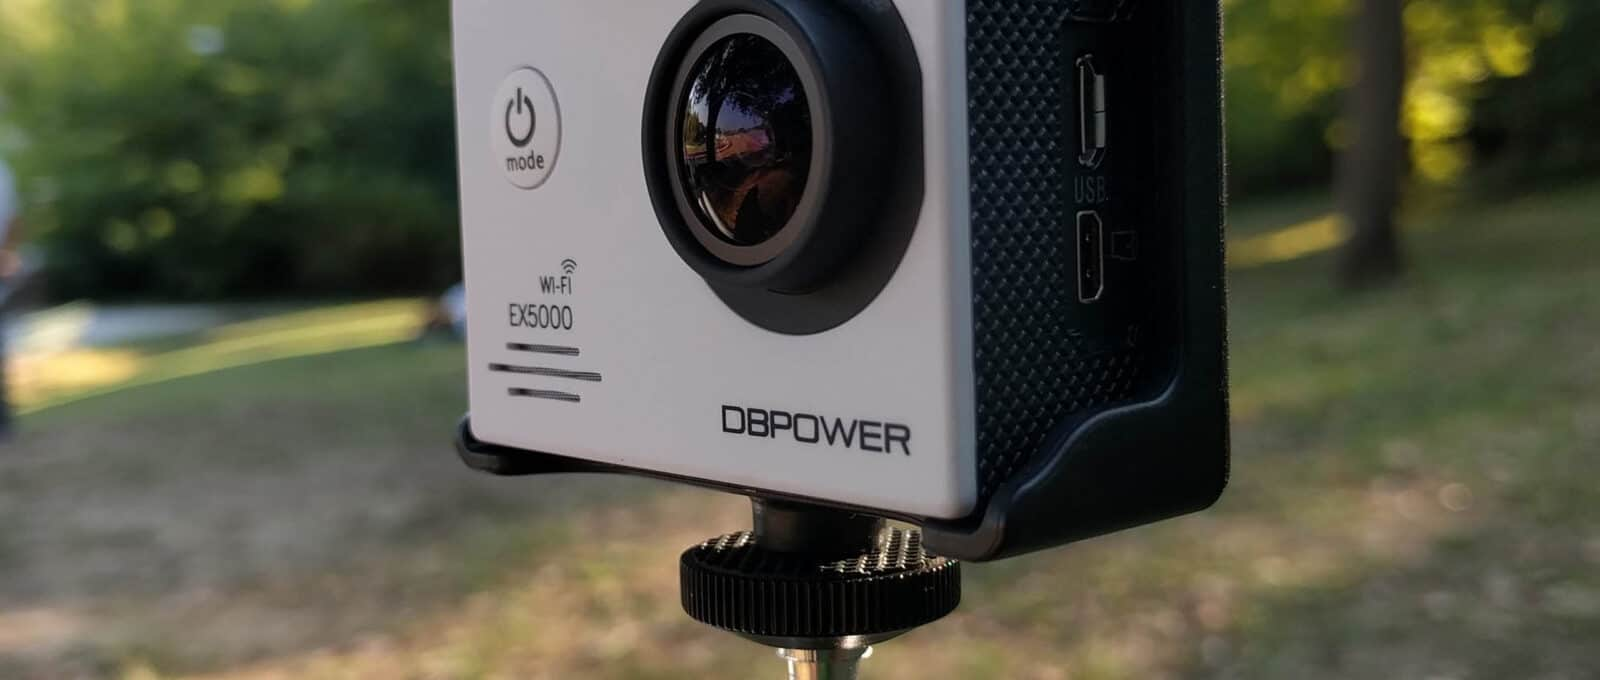 camera dbpower